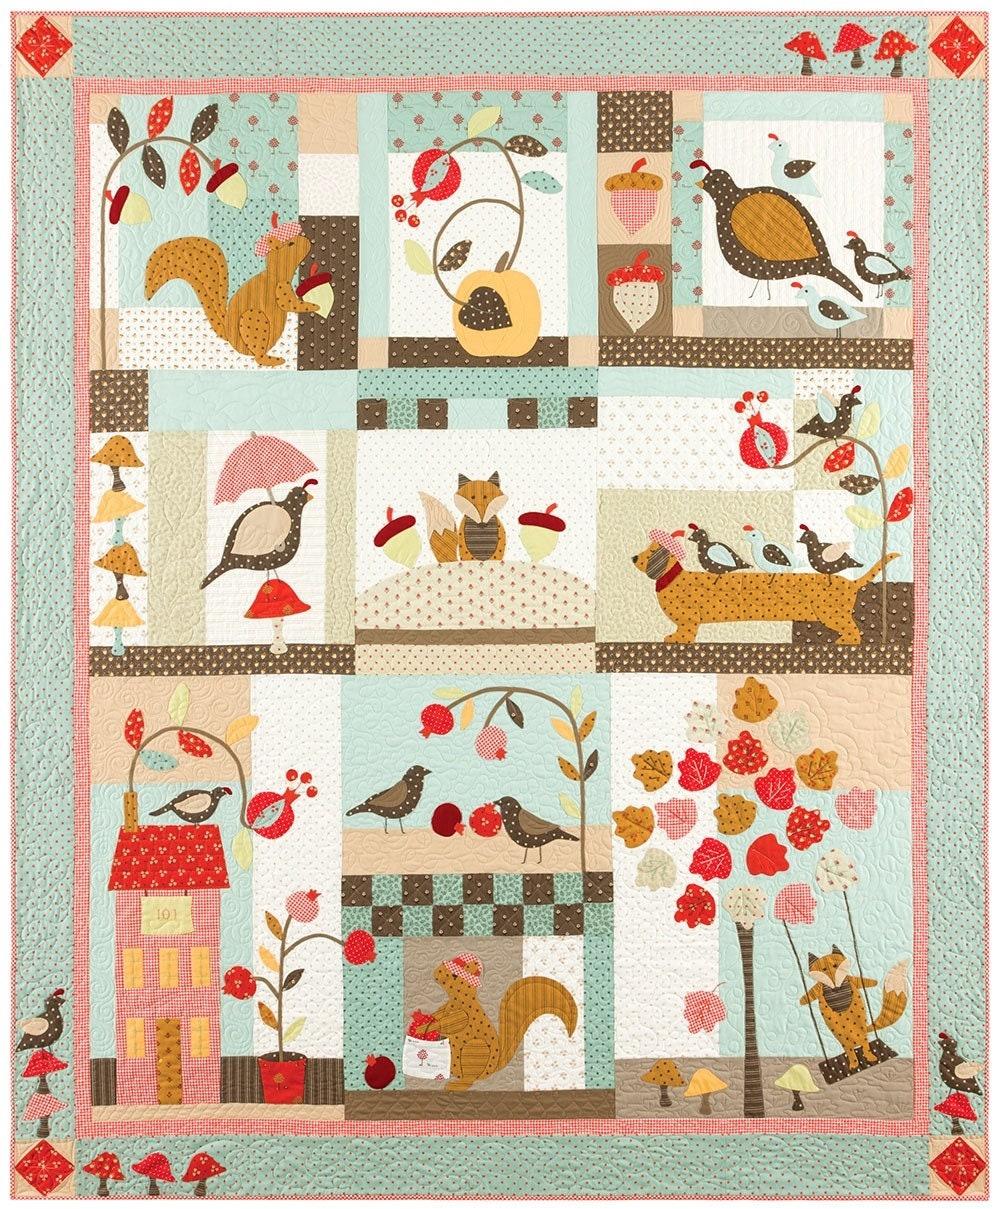 Rue maple 101 Quilt Kit Kit Kit - Bunny Hill Designs & tissus Moda 6ca821